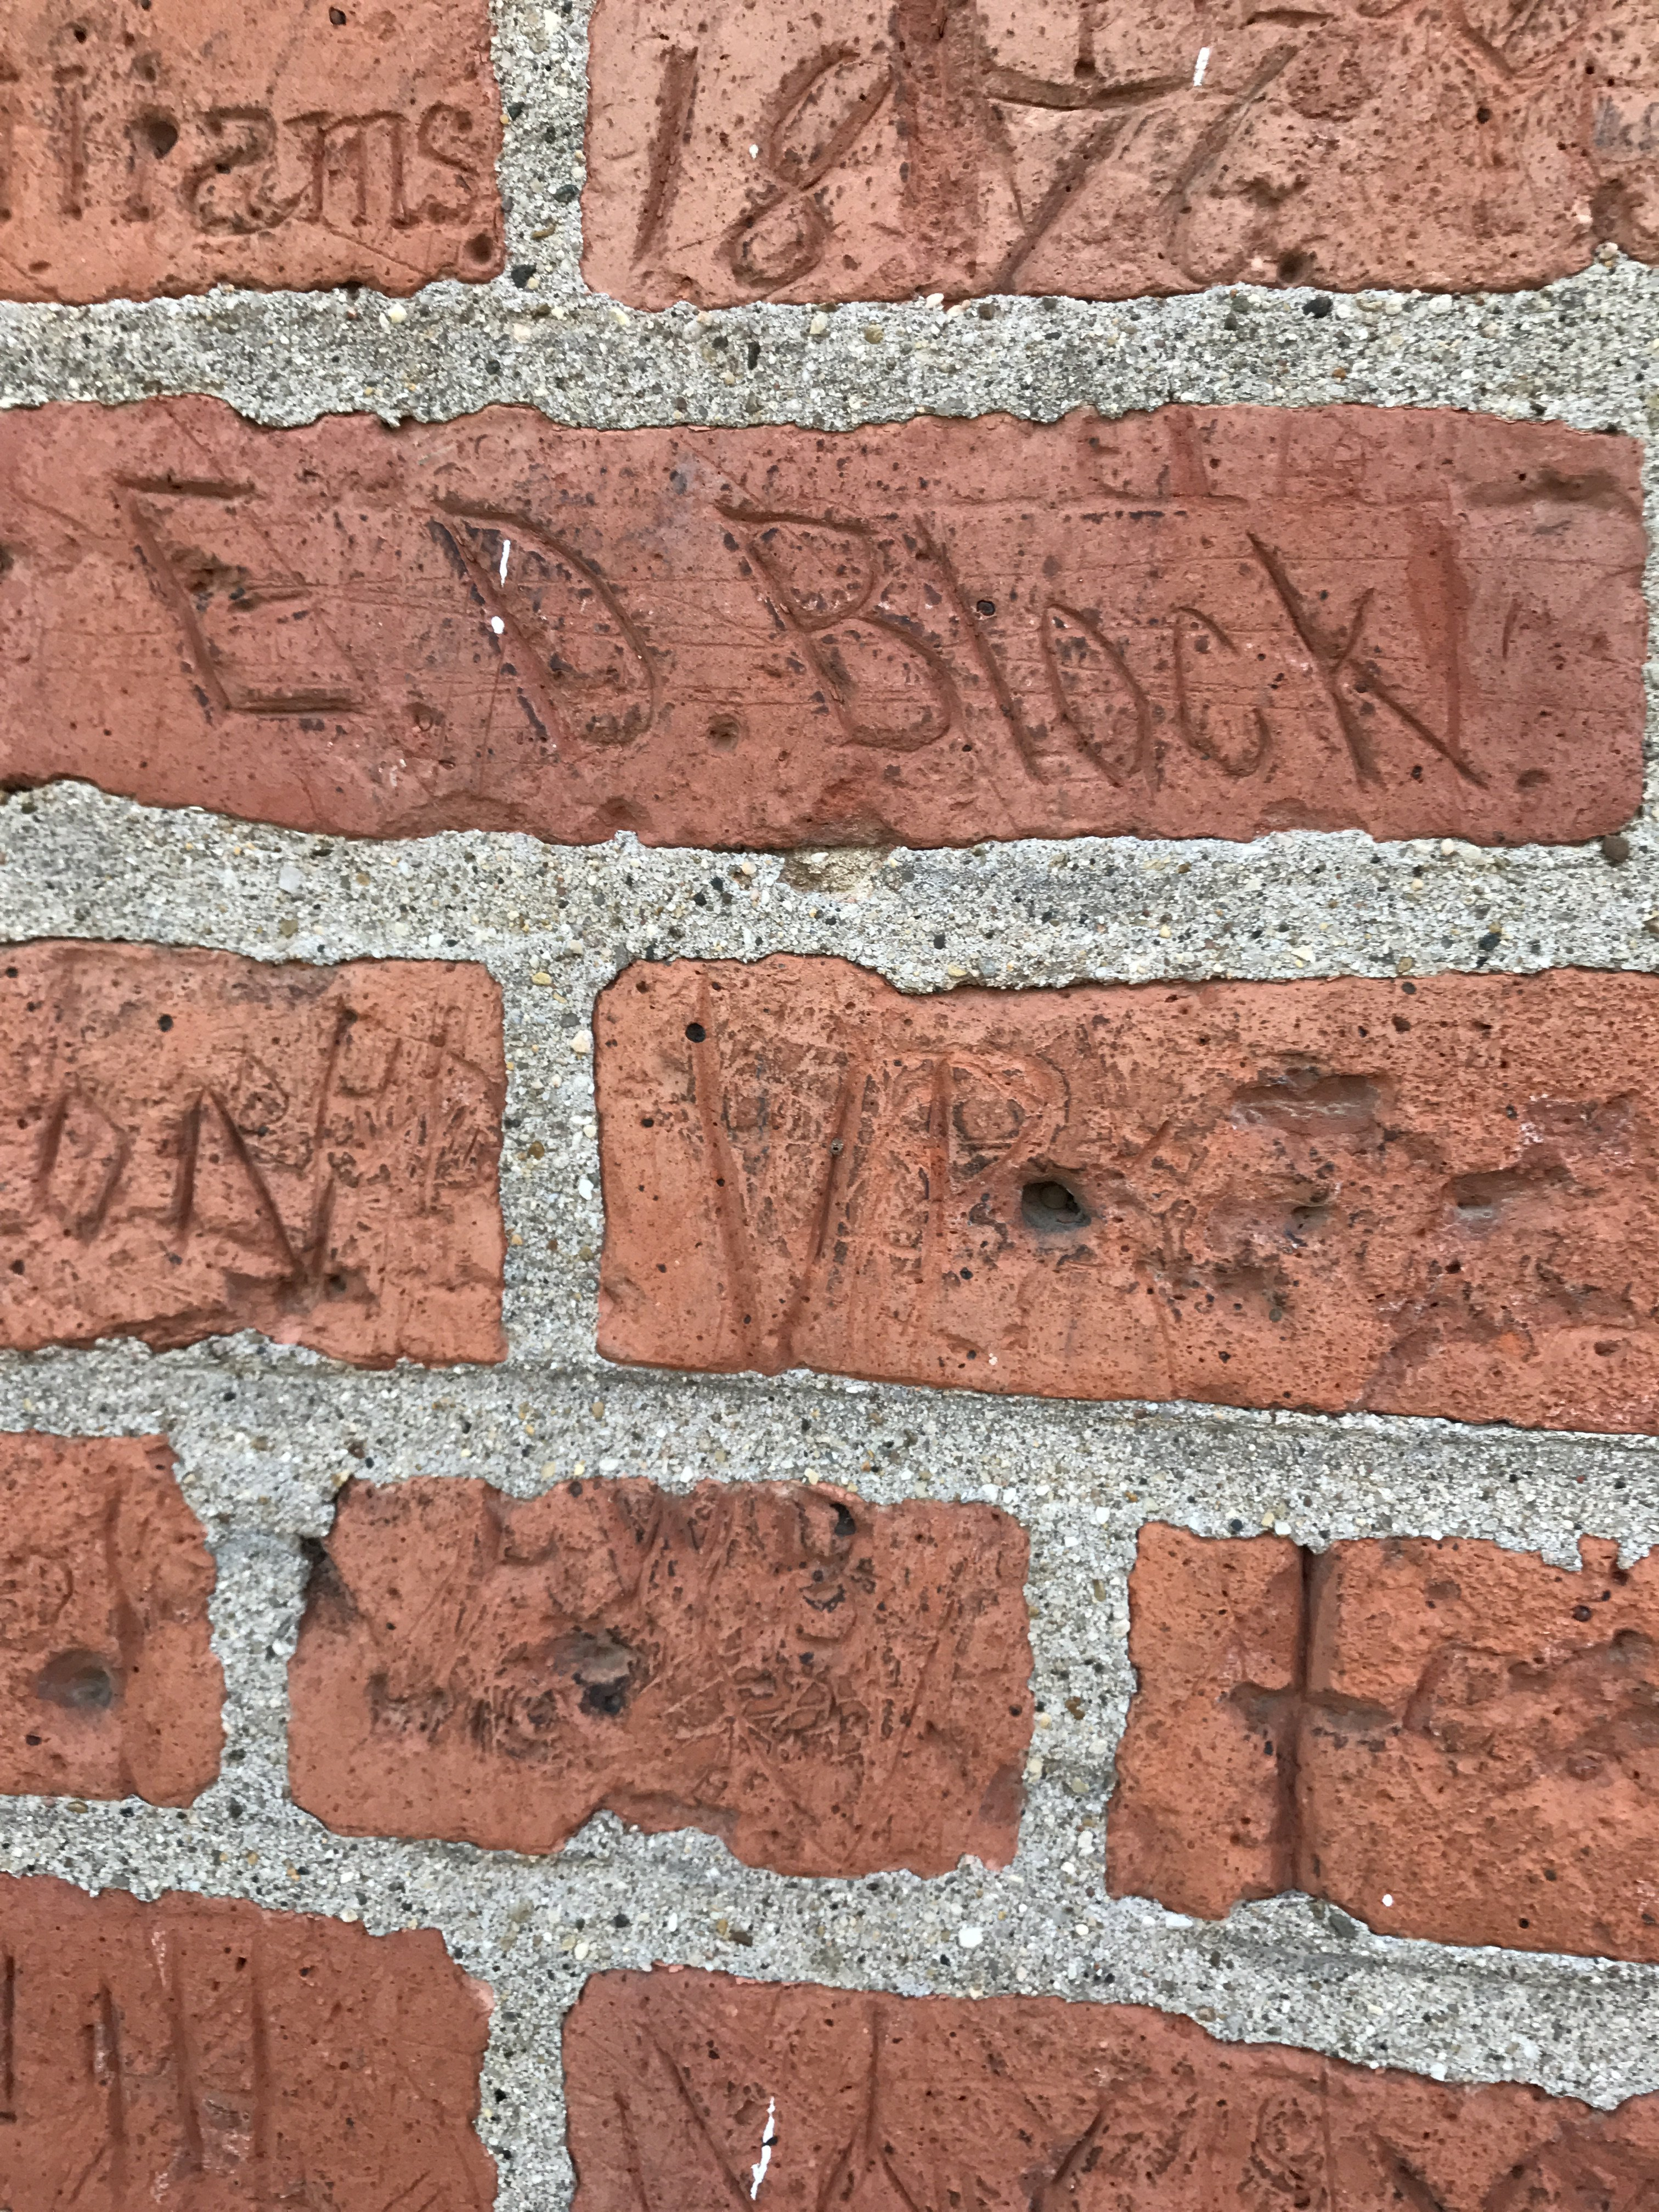 Personalized bricks of Sturtevant Hall.